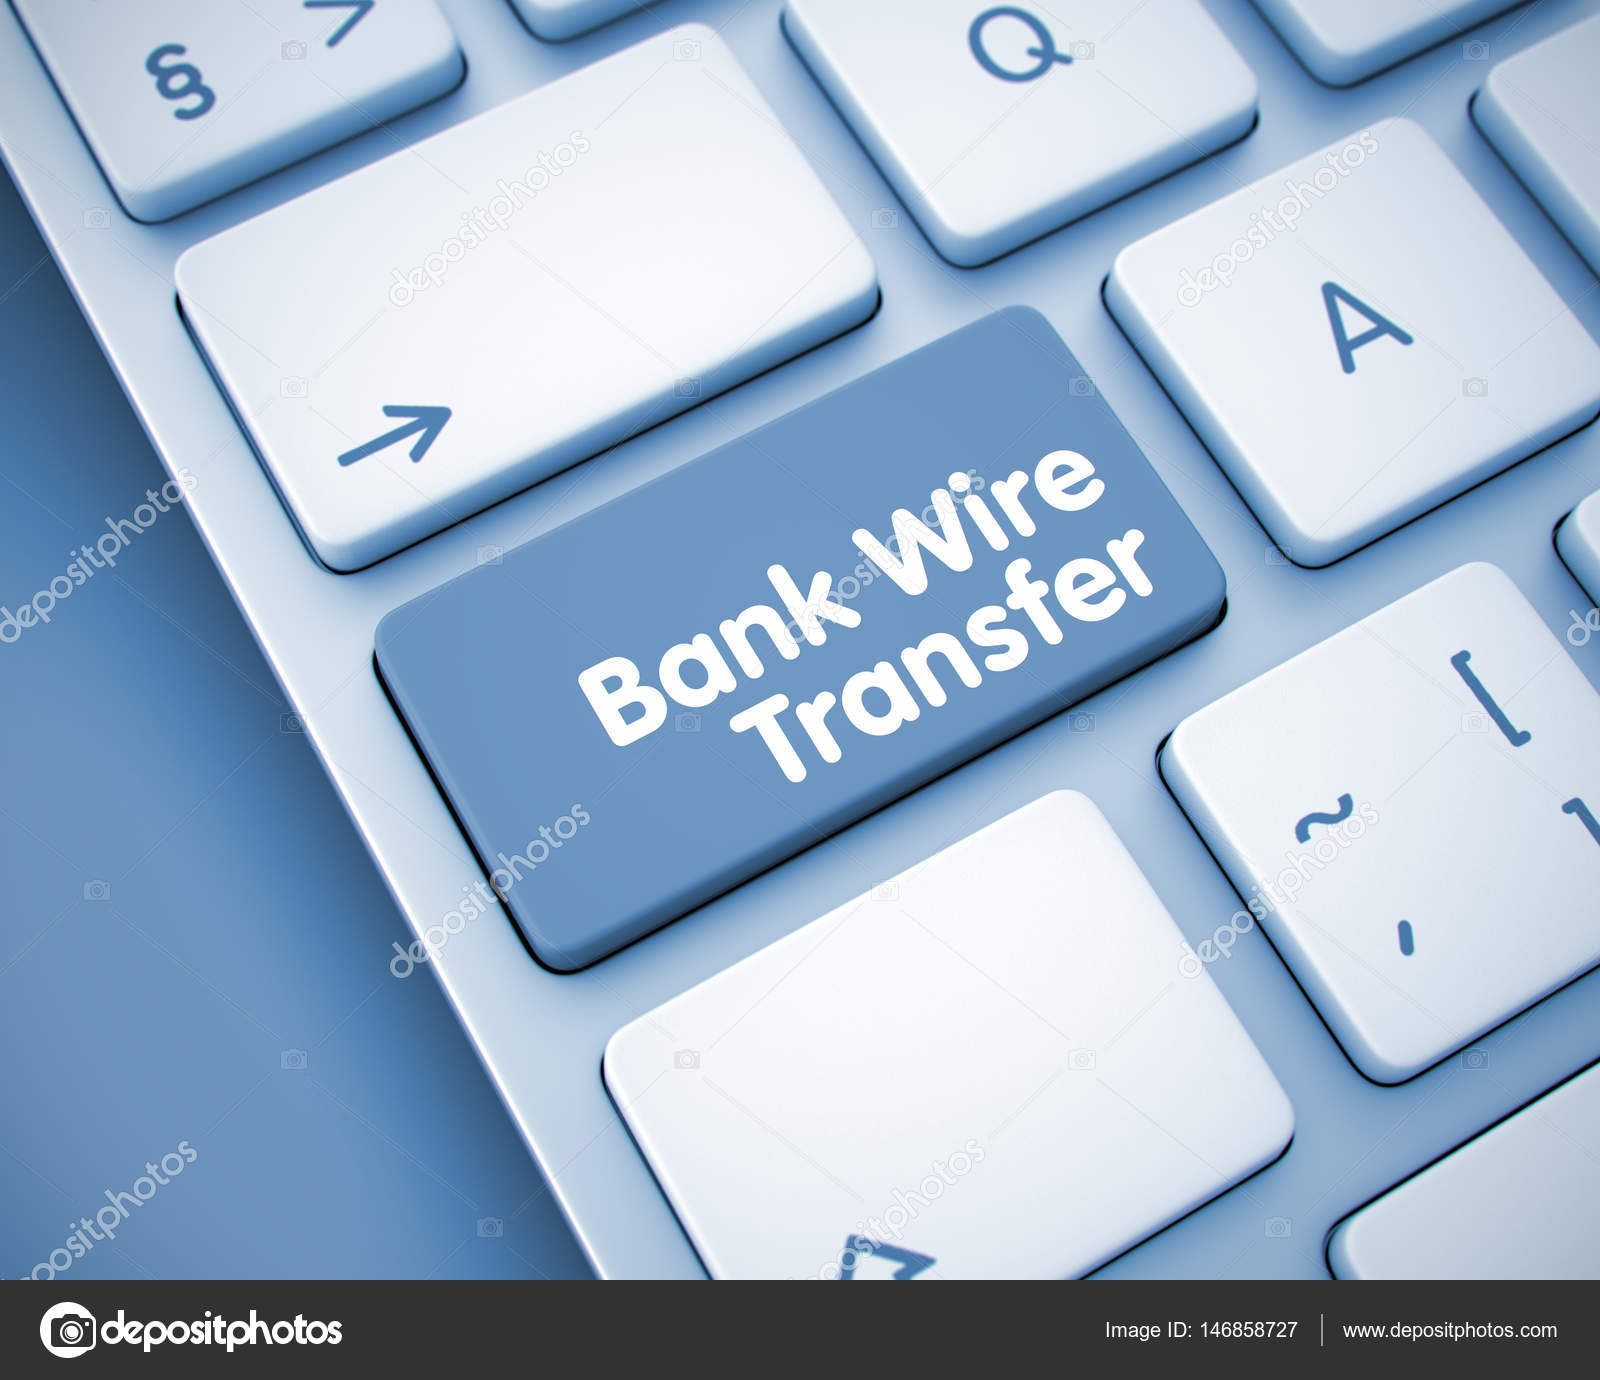 Wire Transfer Key - WIRE Center •